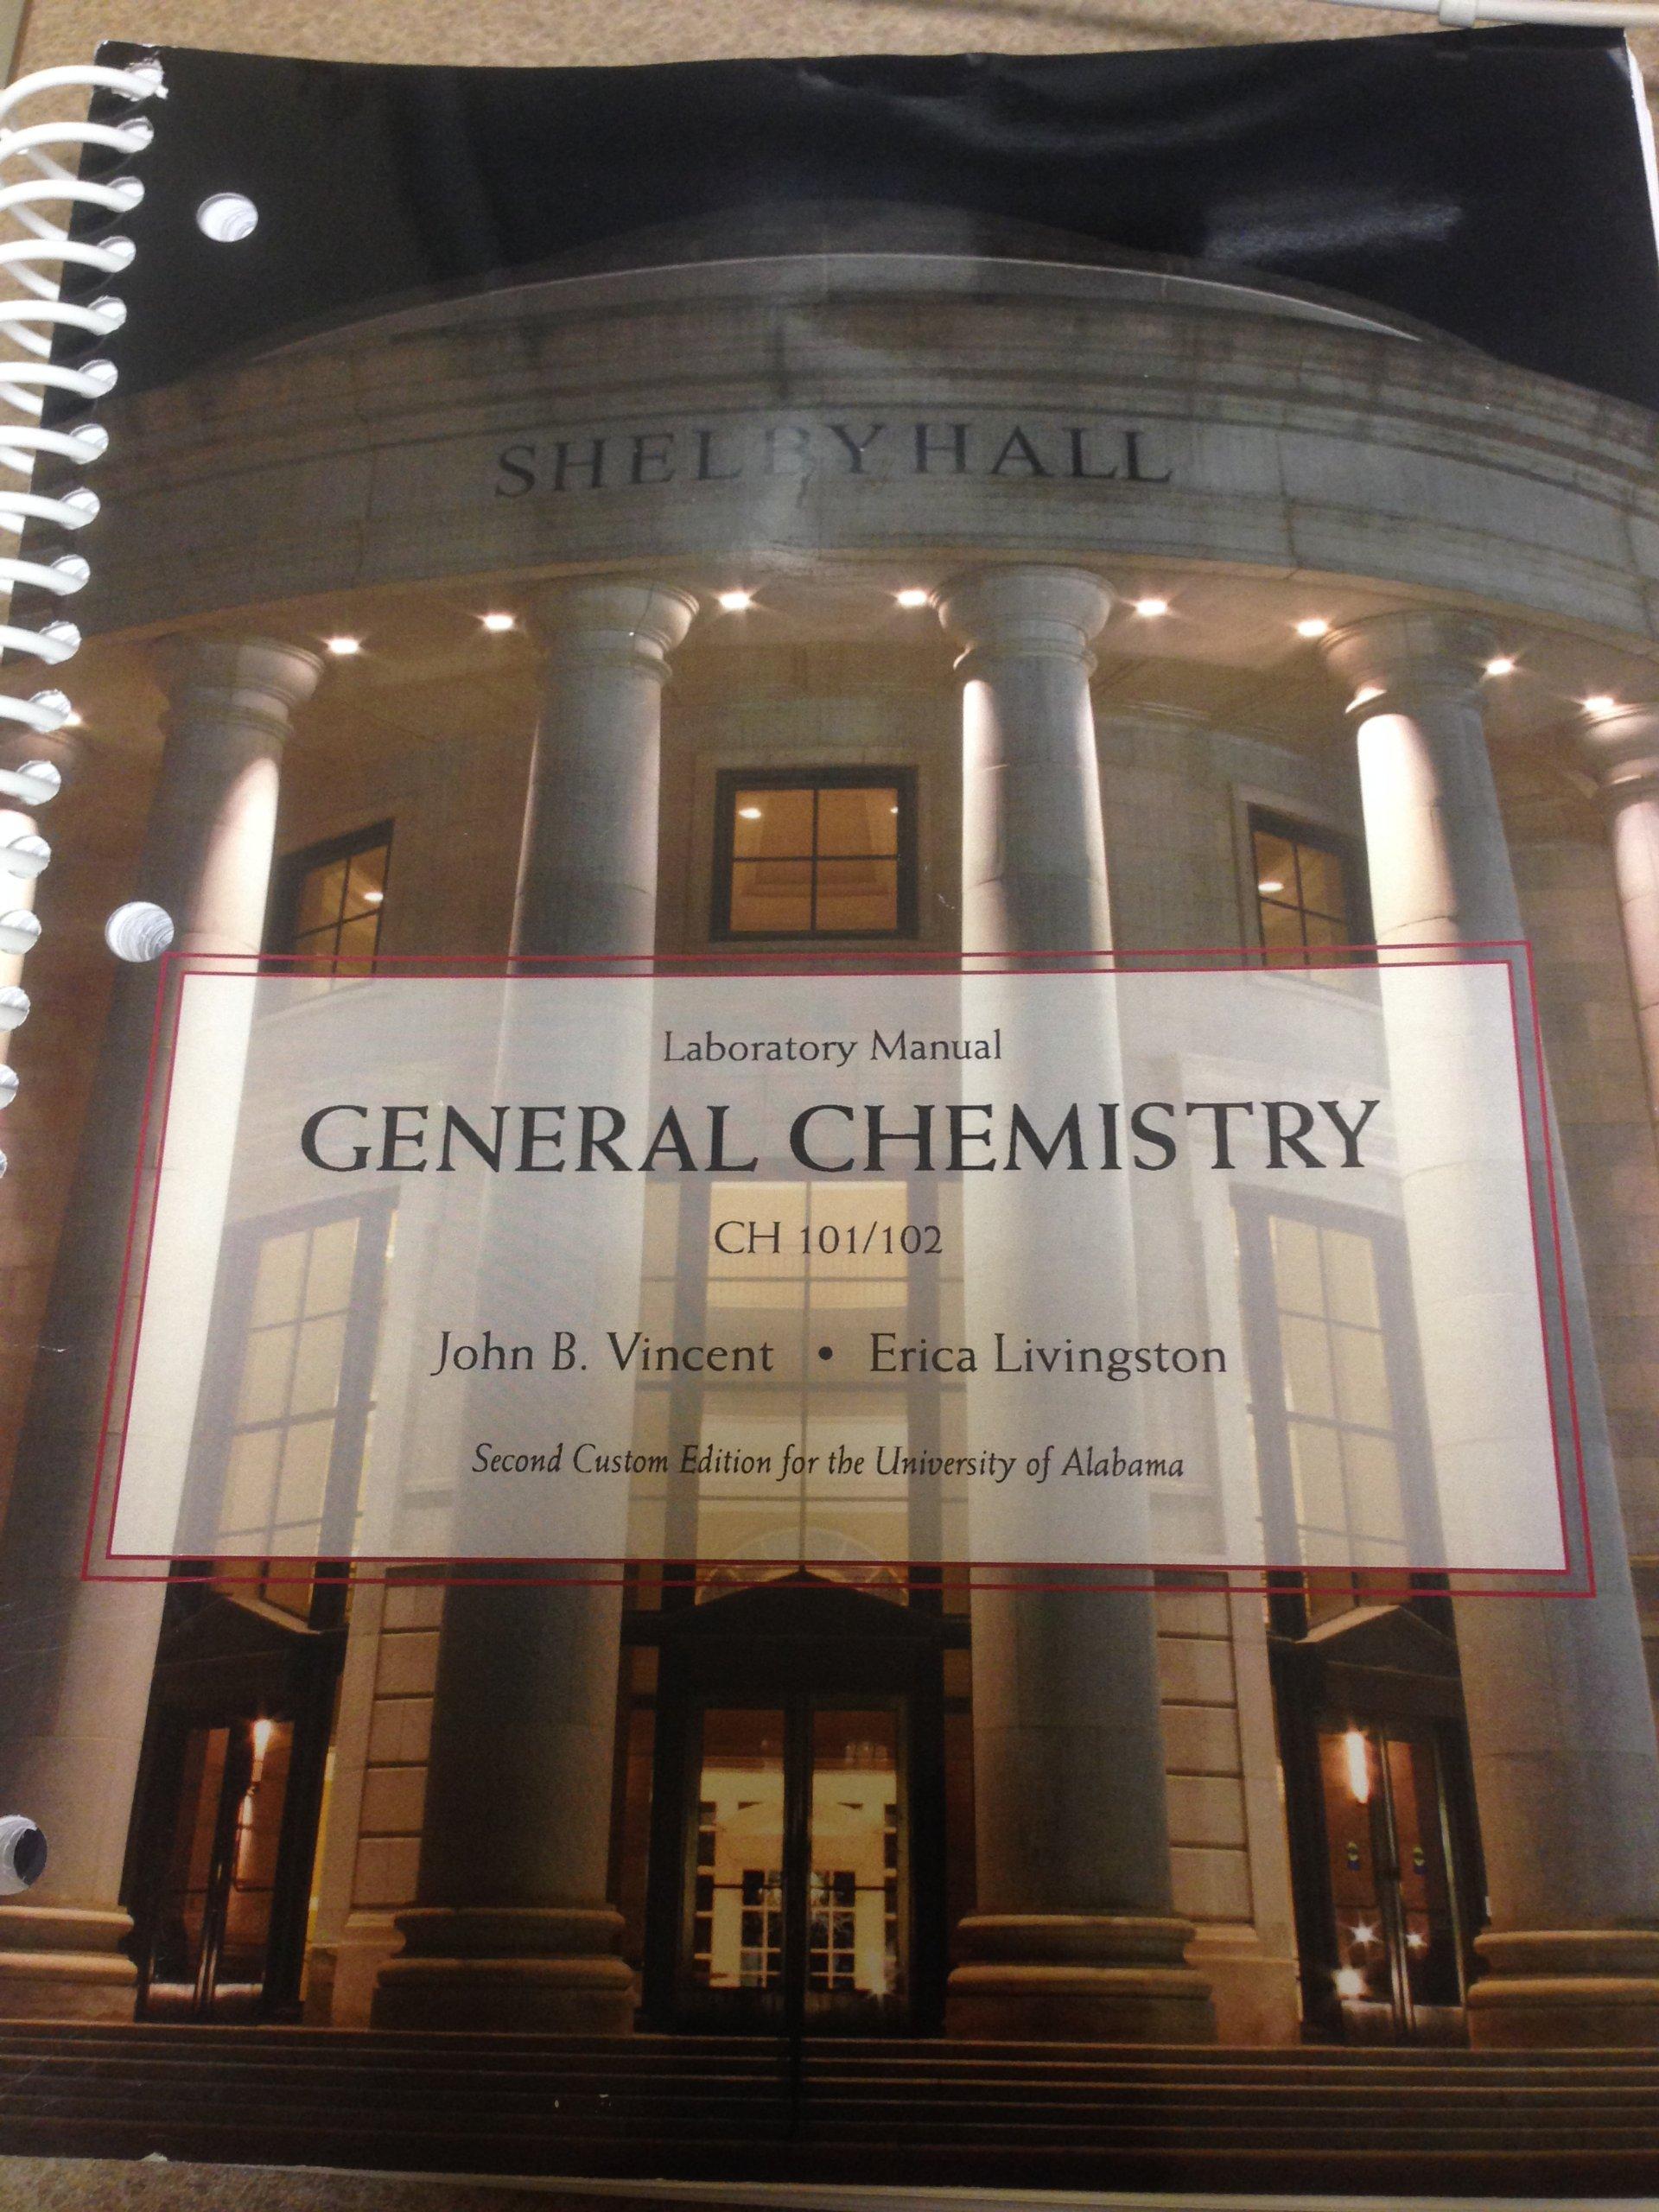 General Chemistry Laboratory Manual Ch 101/102: John B. Vincent, Erica  Livingston: 9781269625845: Amazon.com: Books